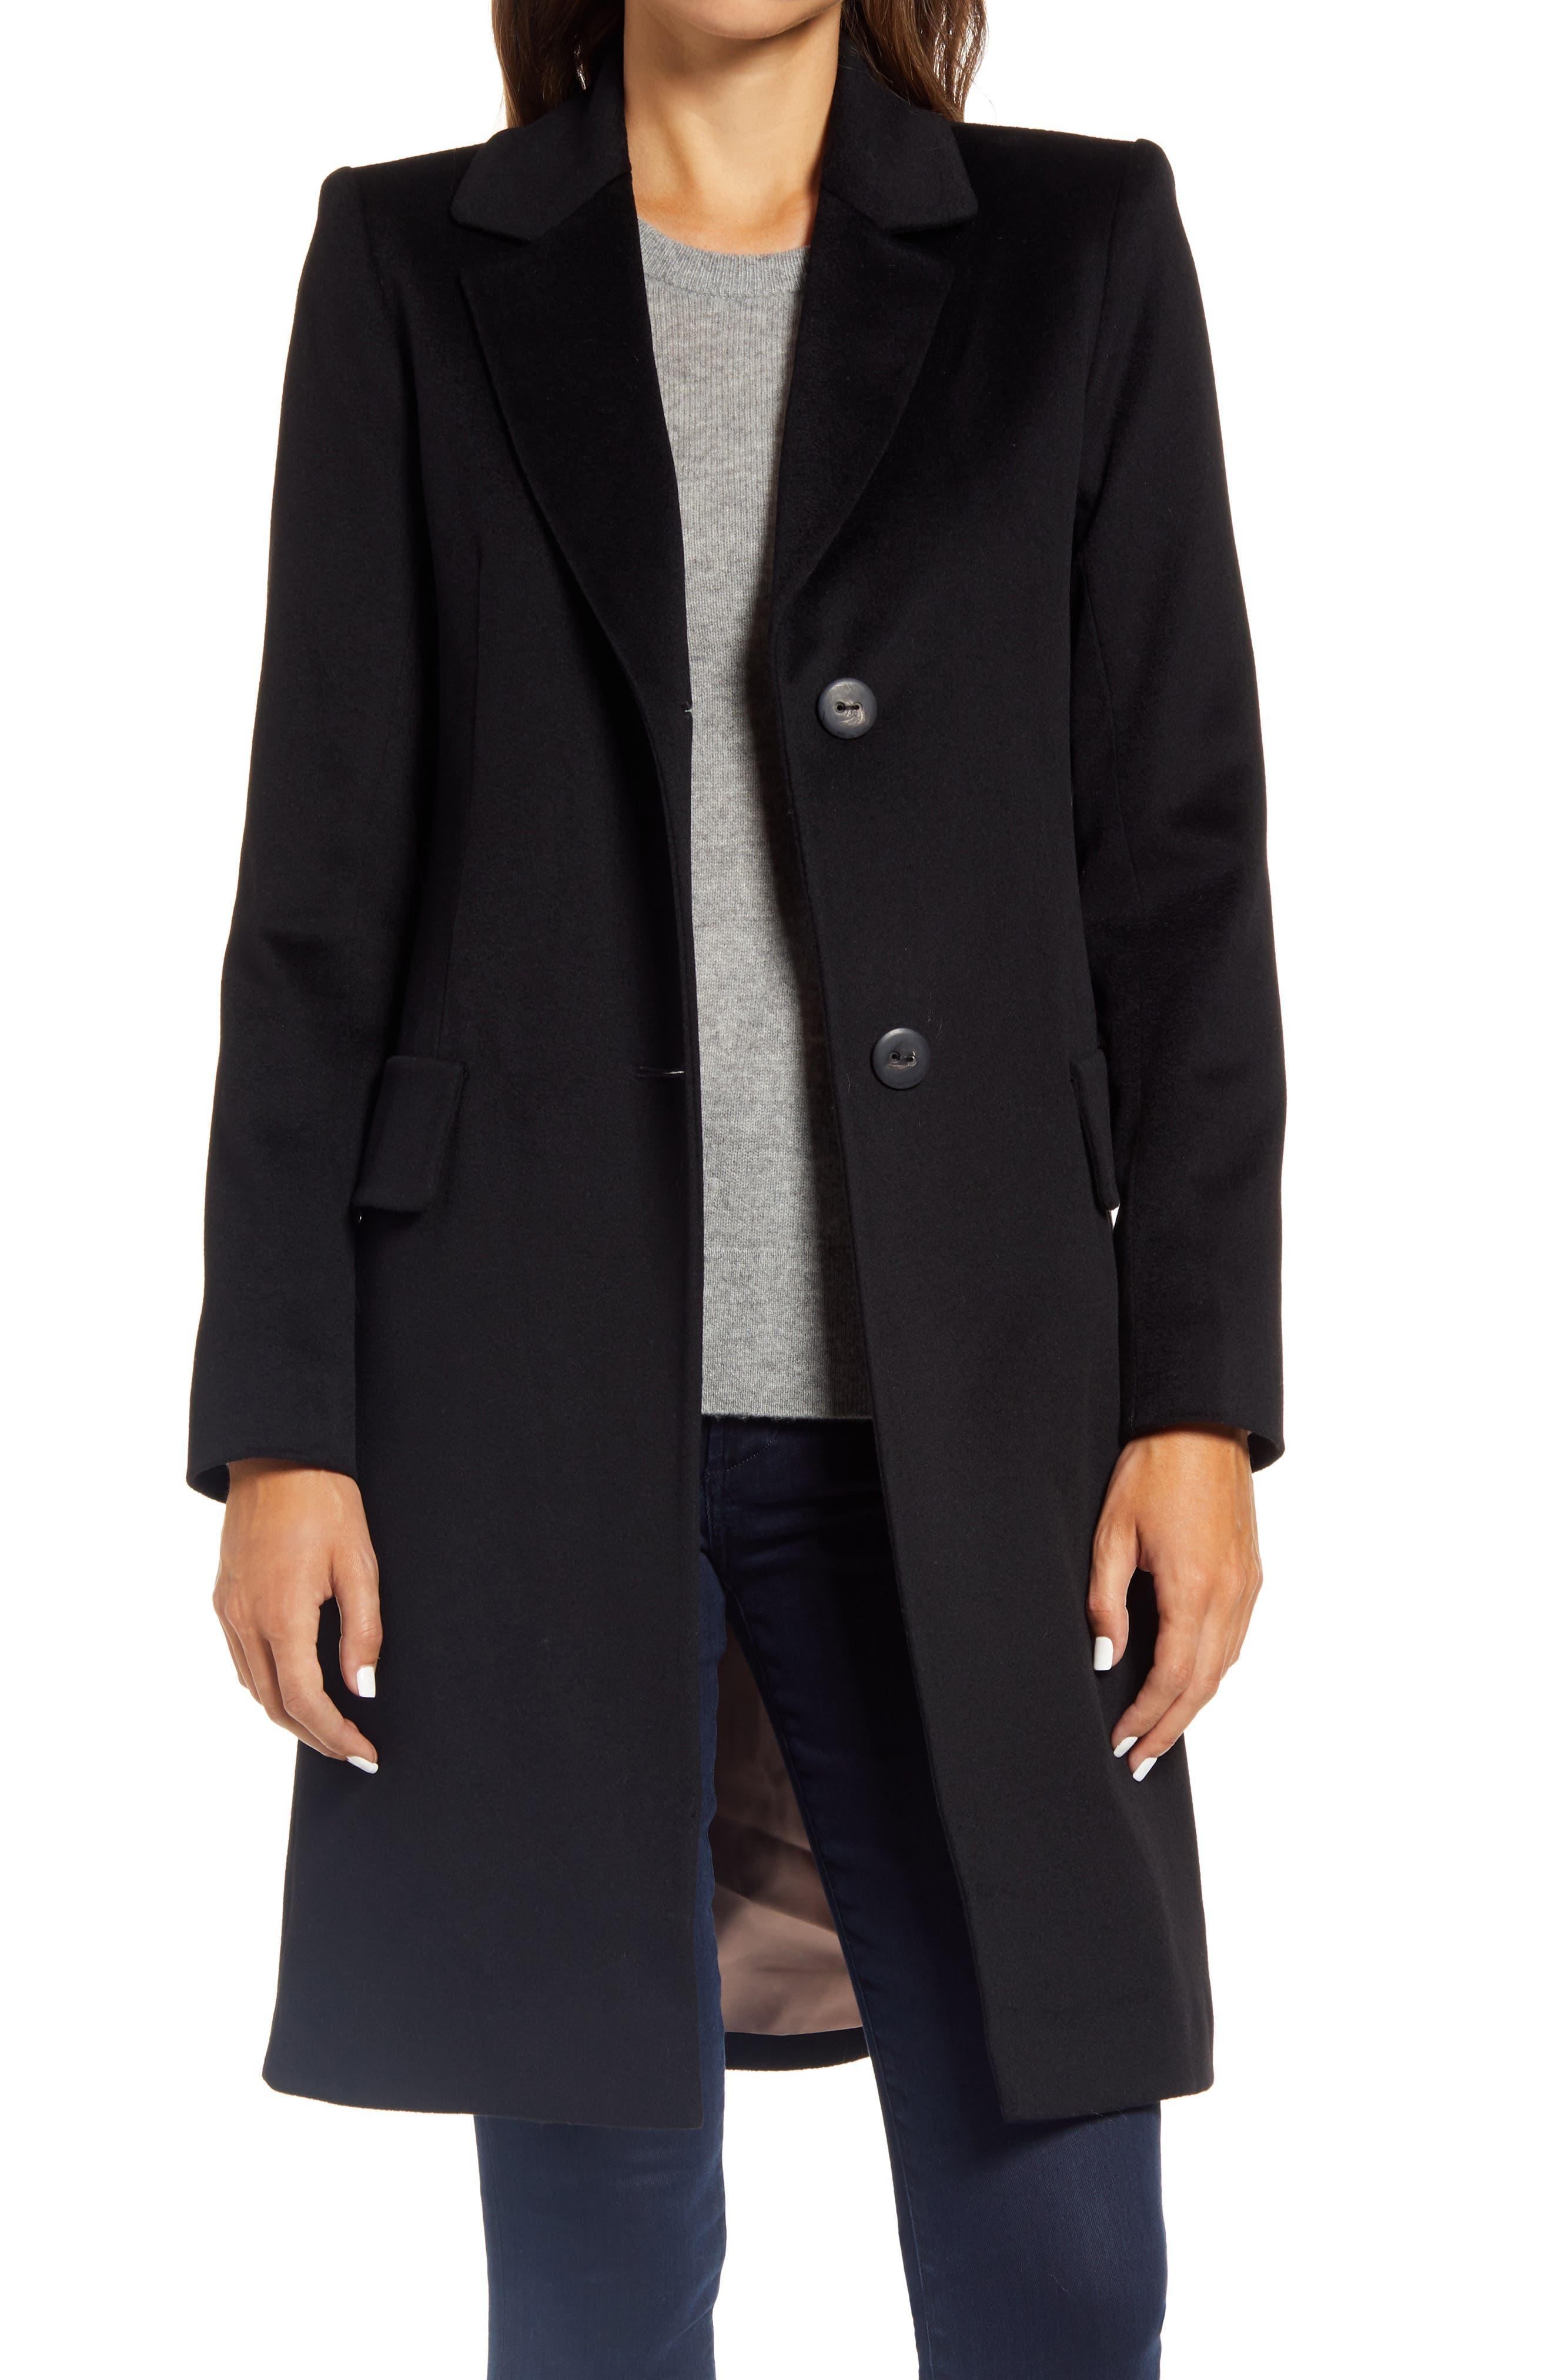 Image of Fleurette Stand Collar Wool Car Coat